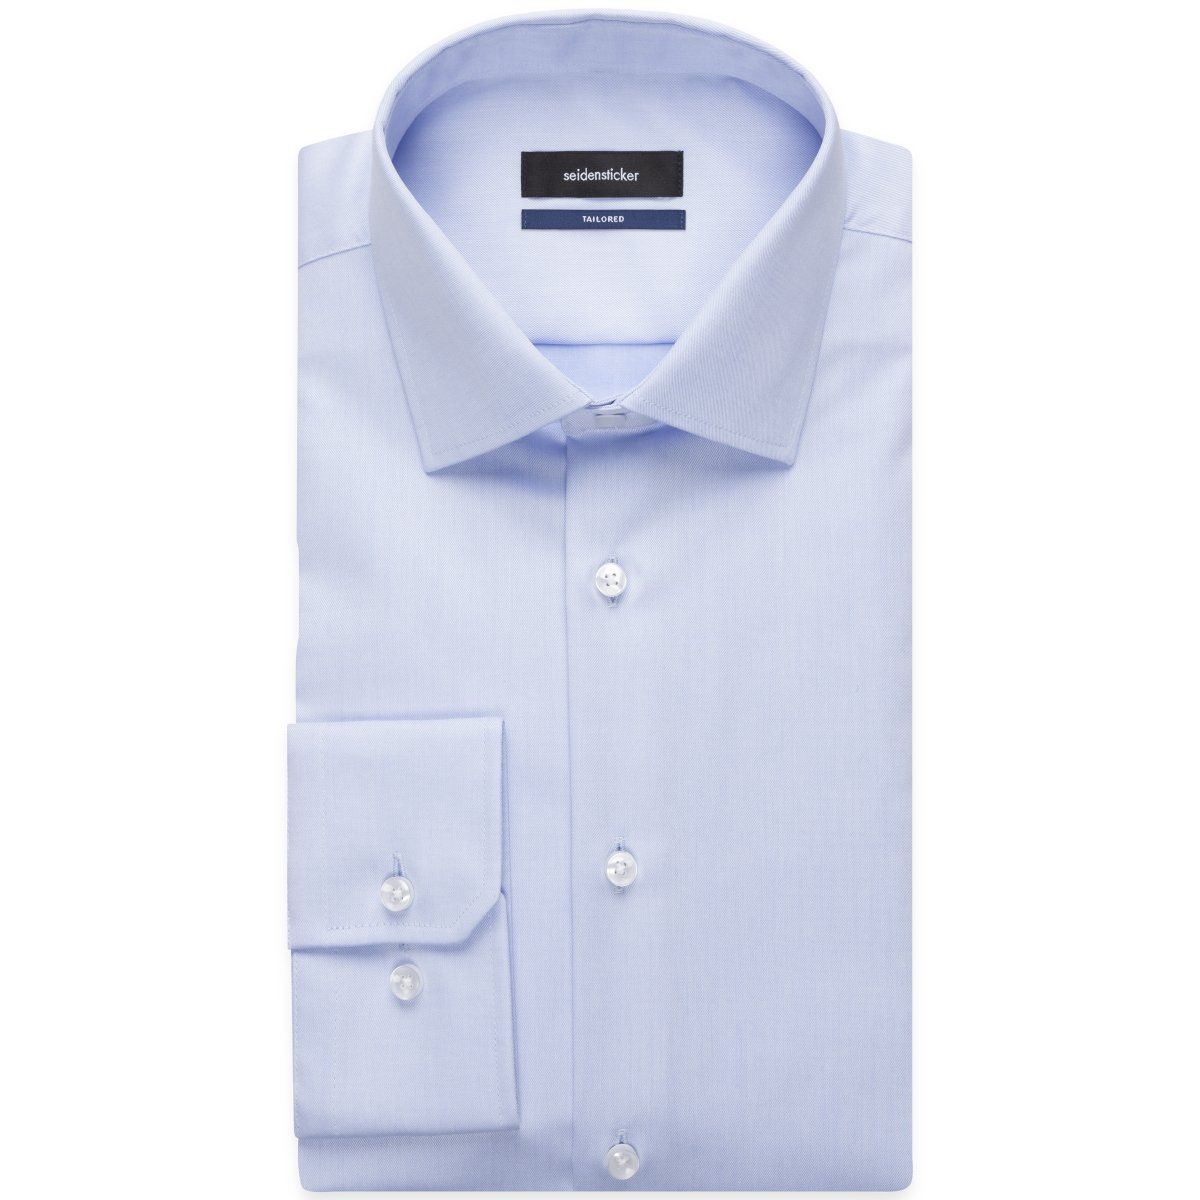 Seidensticker Camisa de Oficina para Hombre